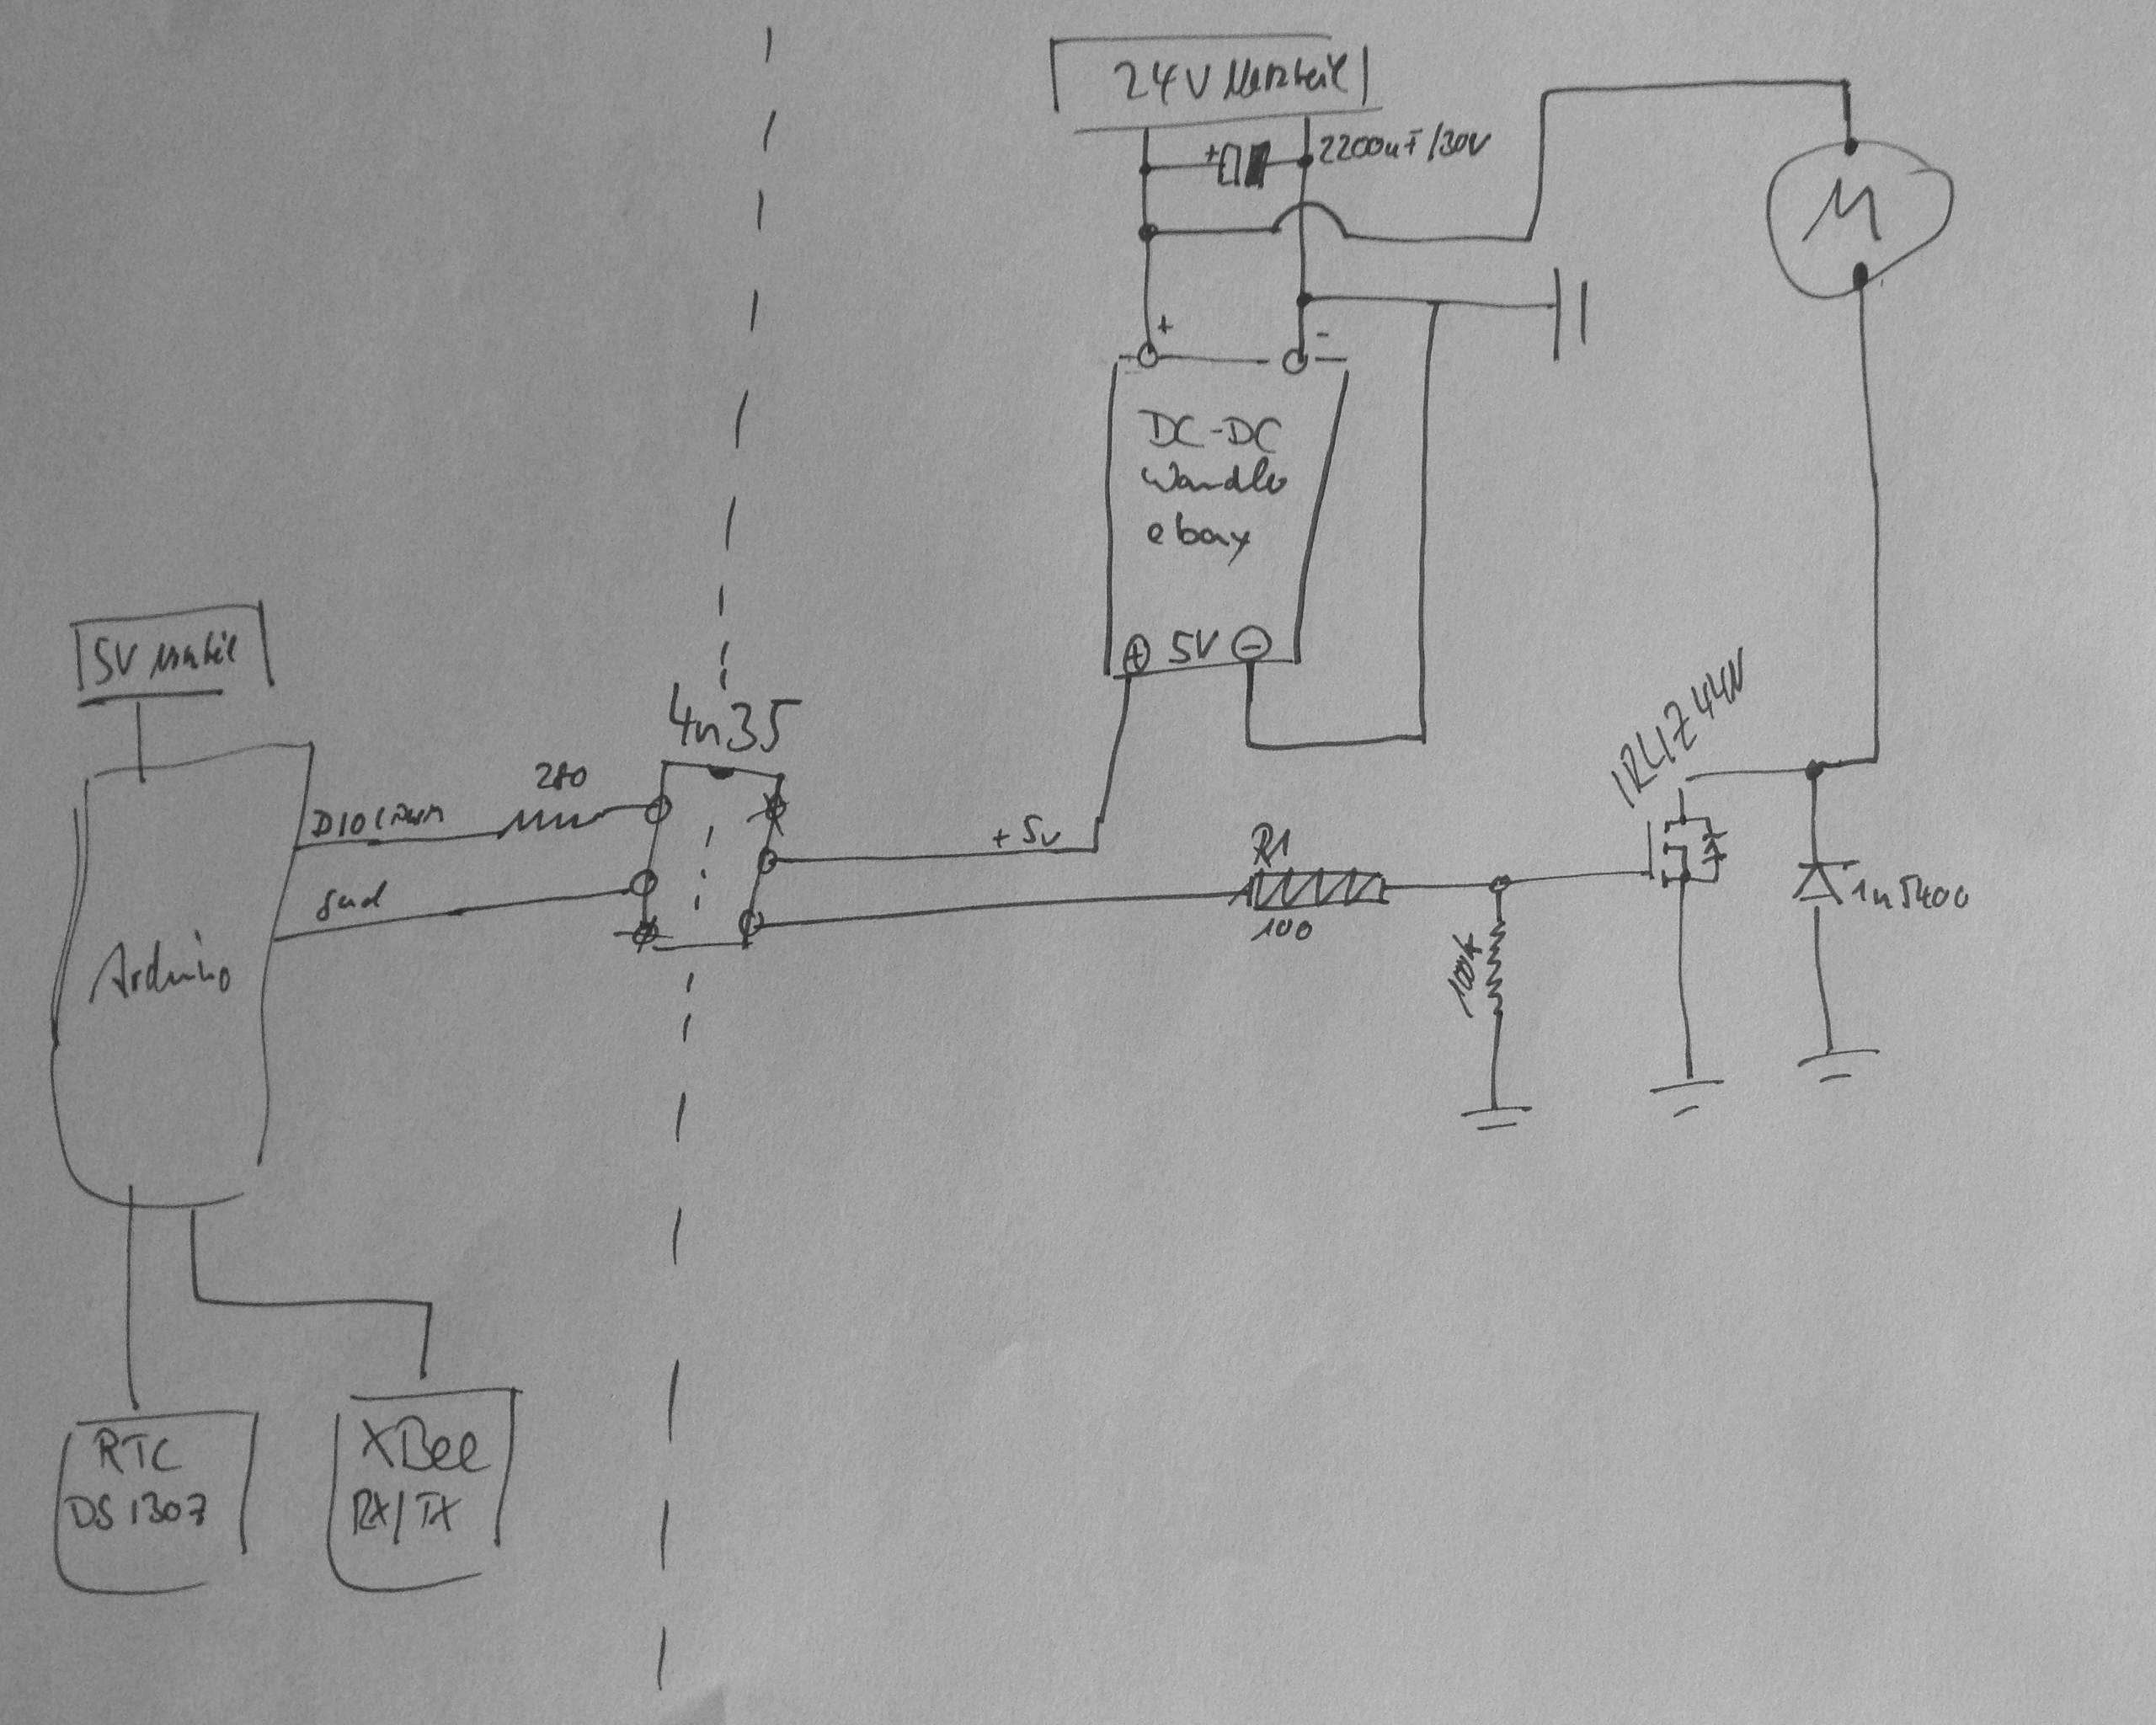 Probleme mit 24v DC Motorsteuerung - Mikrocontroller.net